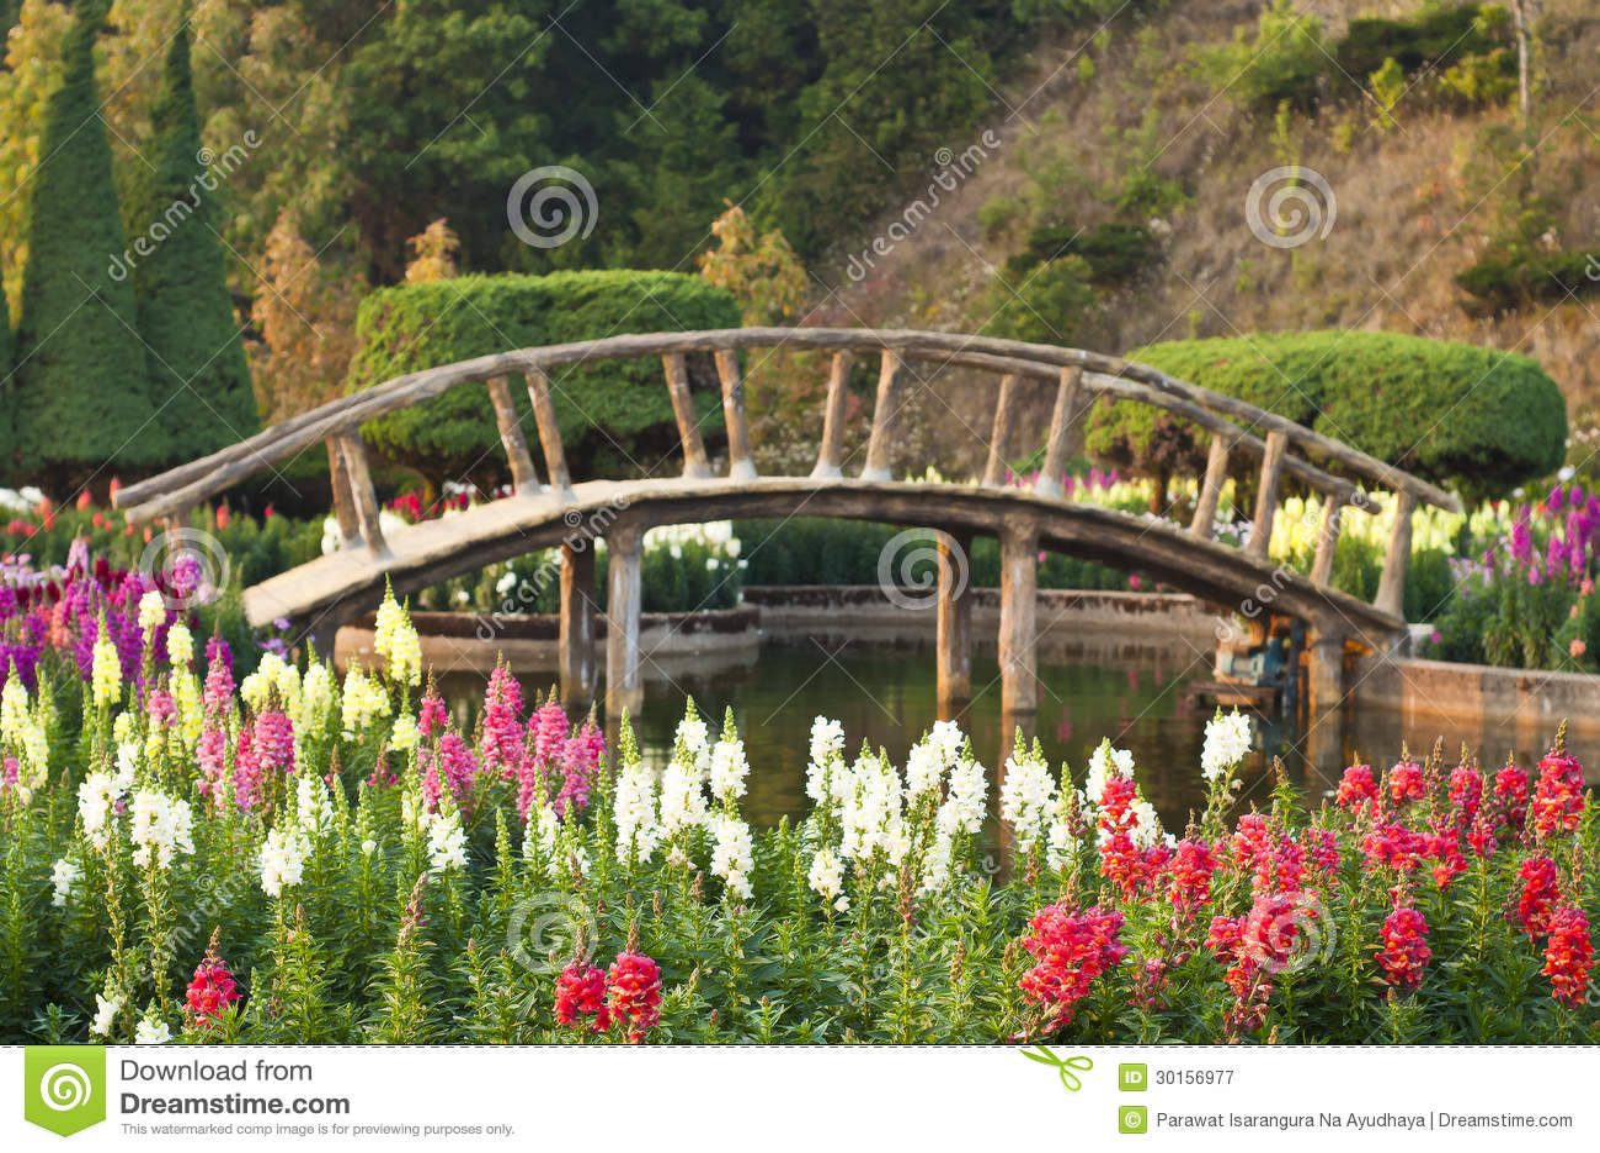 Japanese Style Garden Bridges Flower Garden Japanese Style Royalty Free Stock Photography